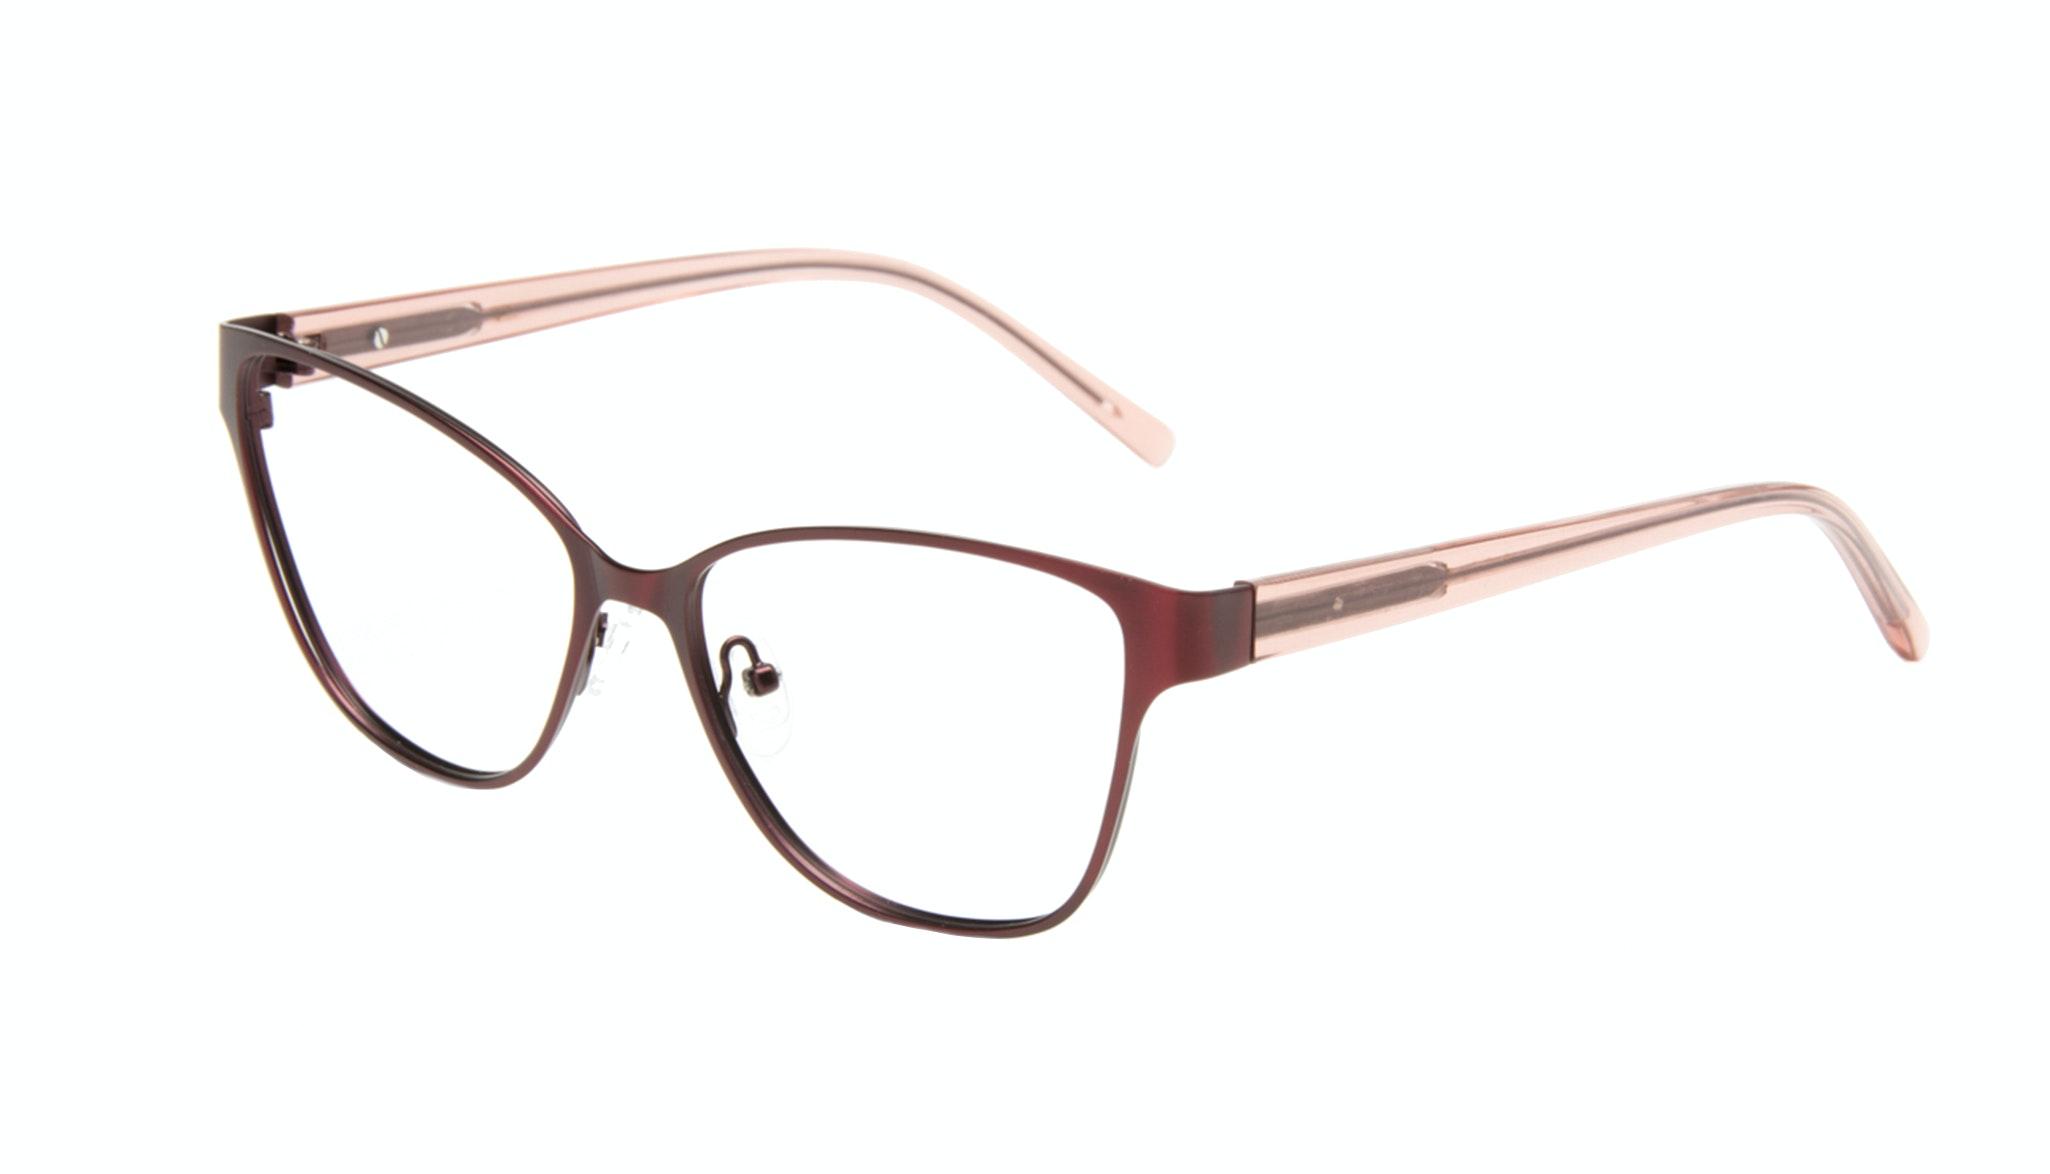 Affordable Fashion Glasses Rectangle Eyeglasses Women Radiant Cranberry Tilt